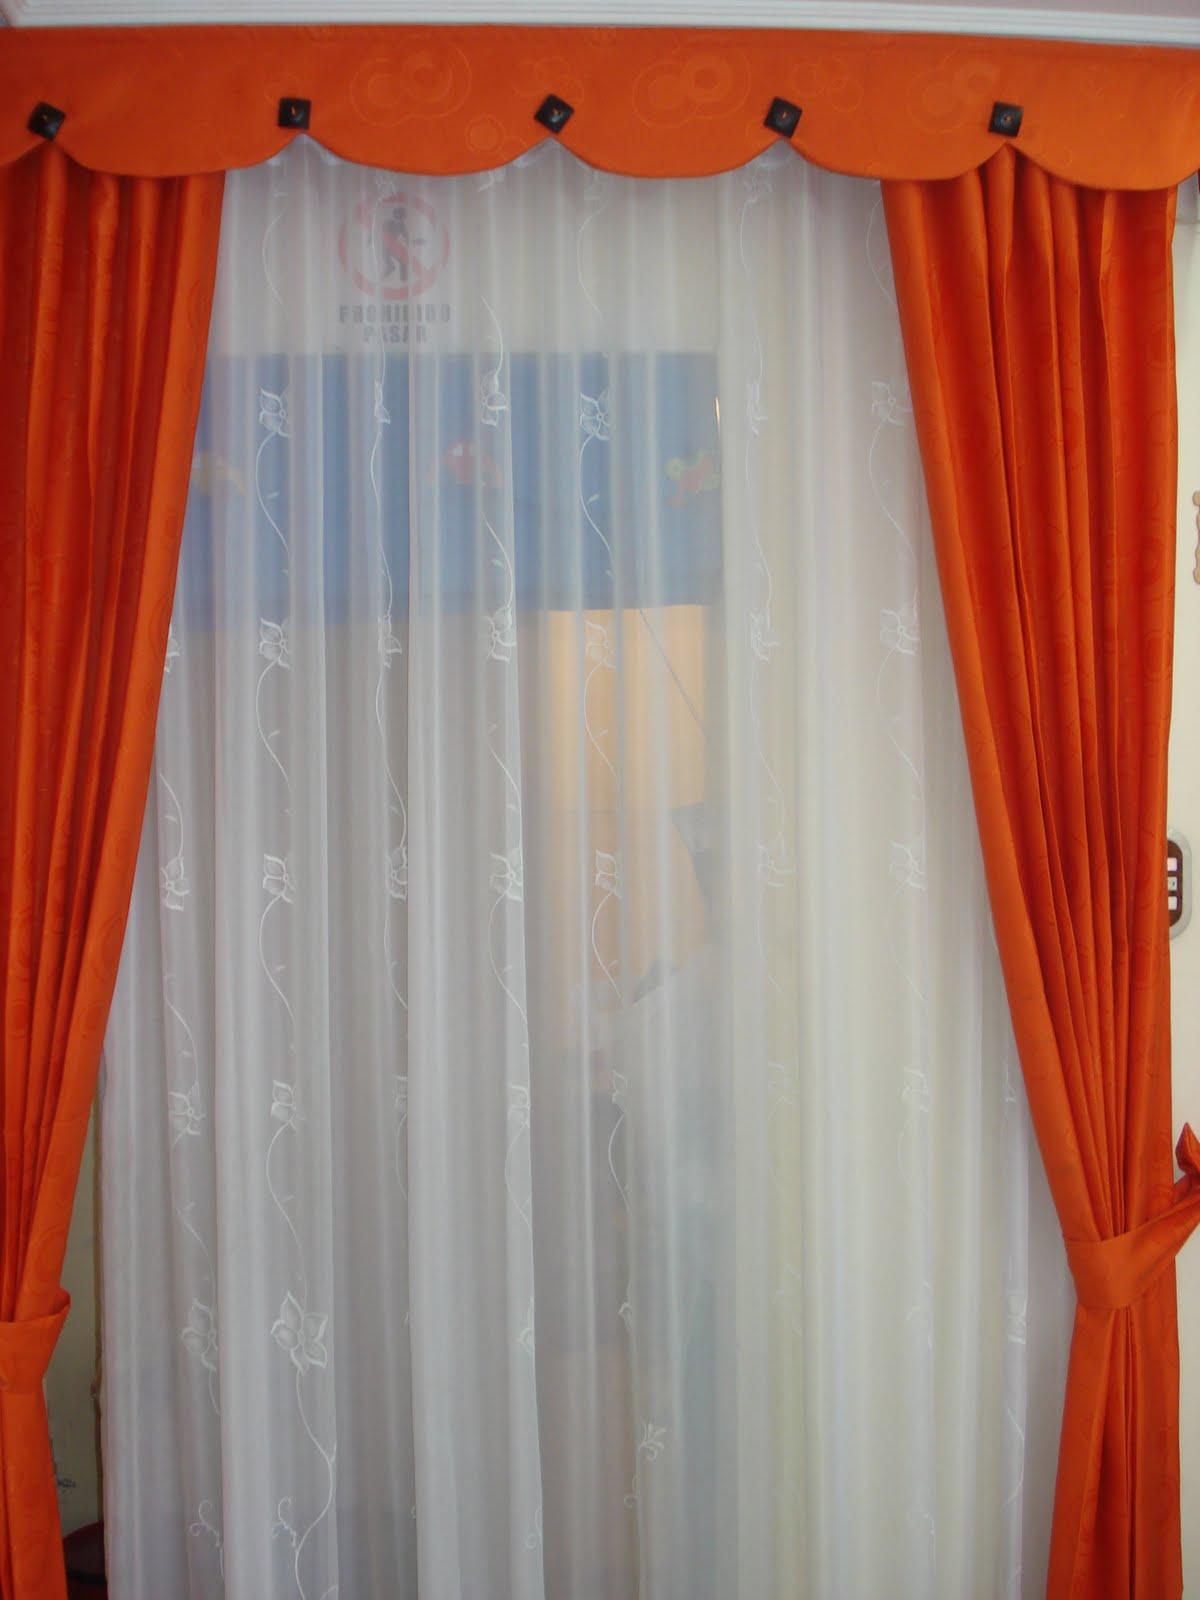 Accesorios para el hogar zajema cortinas en boton - Ultima moda en cortinas ...